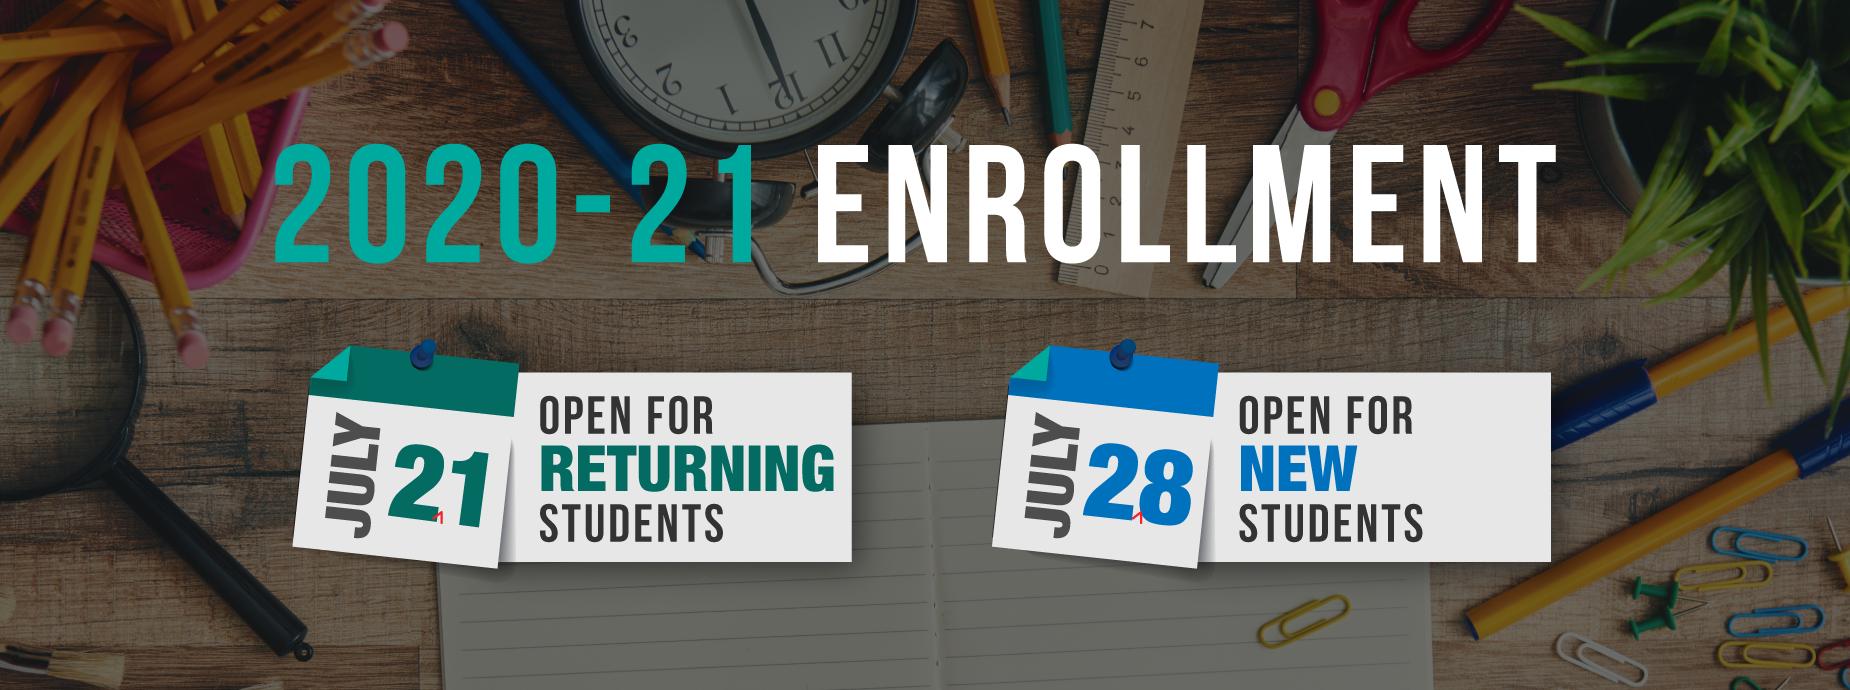 2020-21 Enrollment Banner